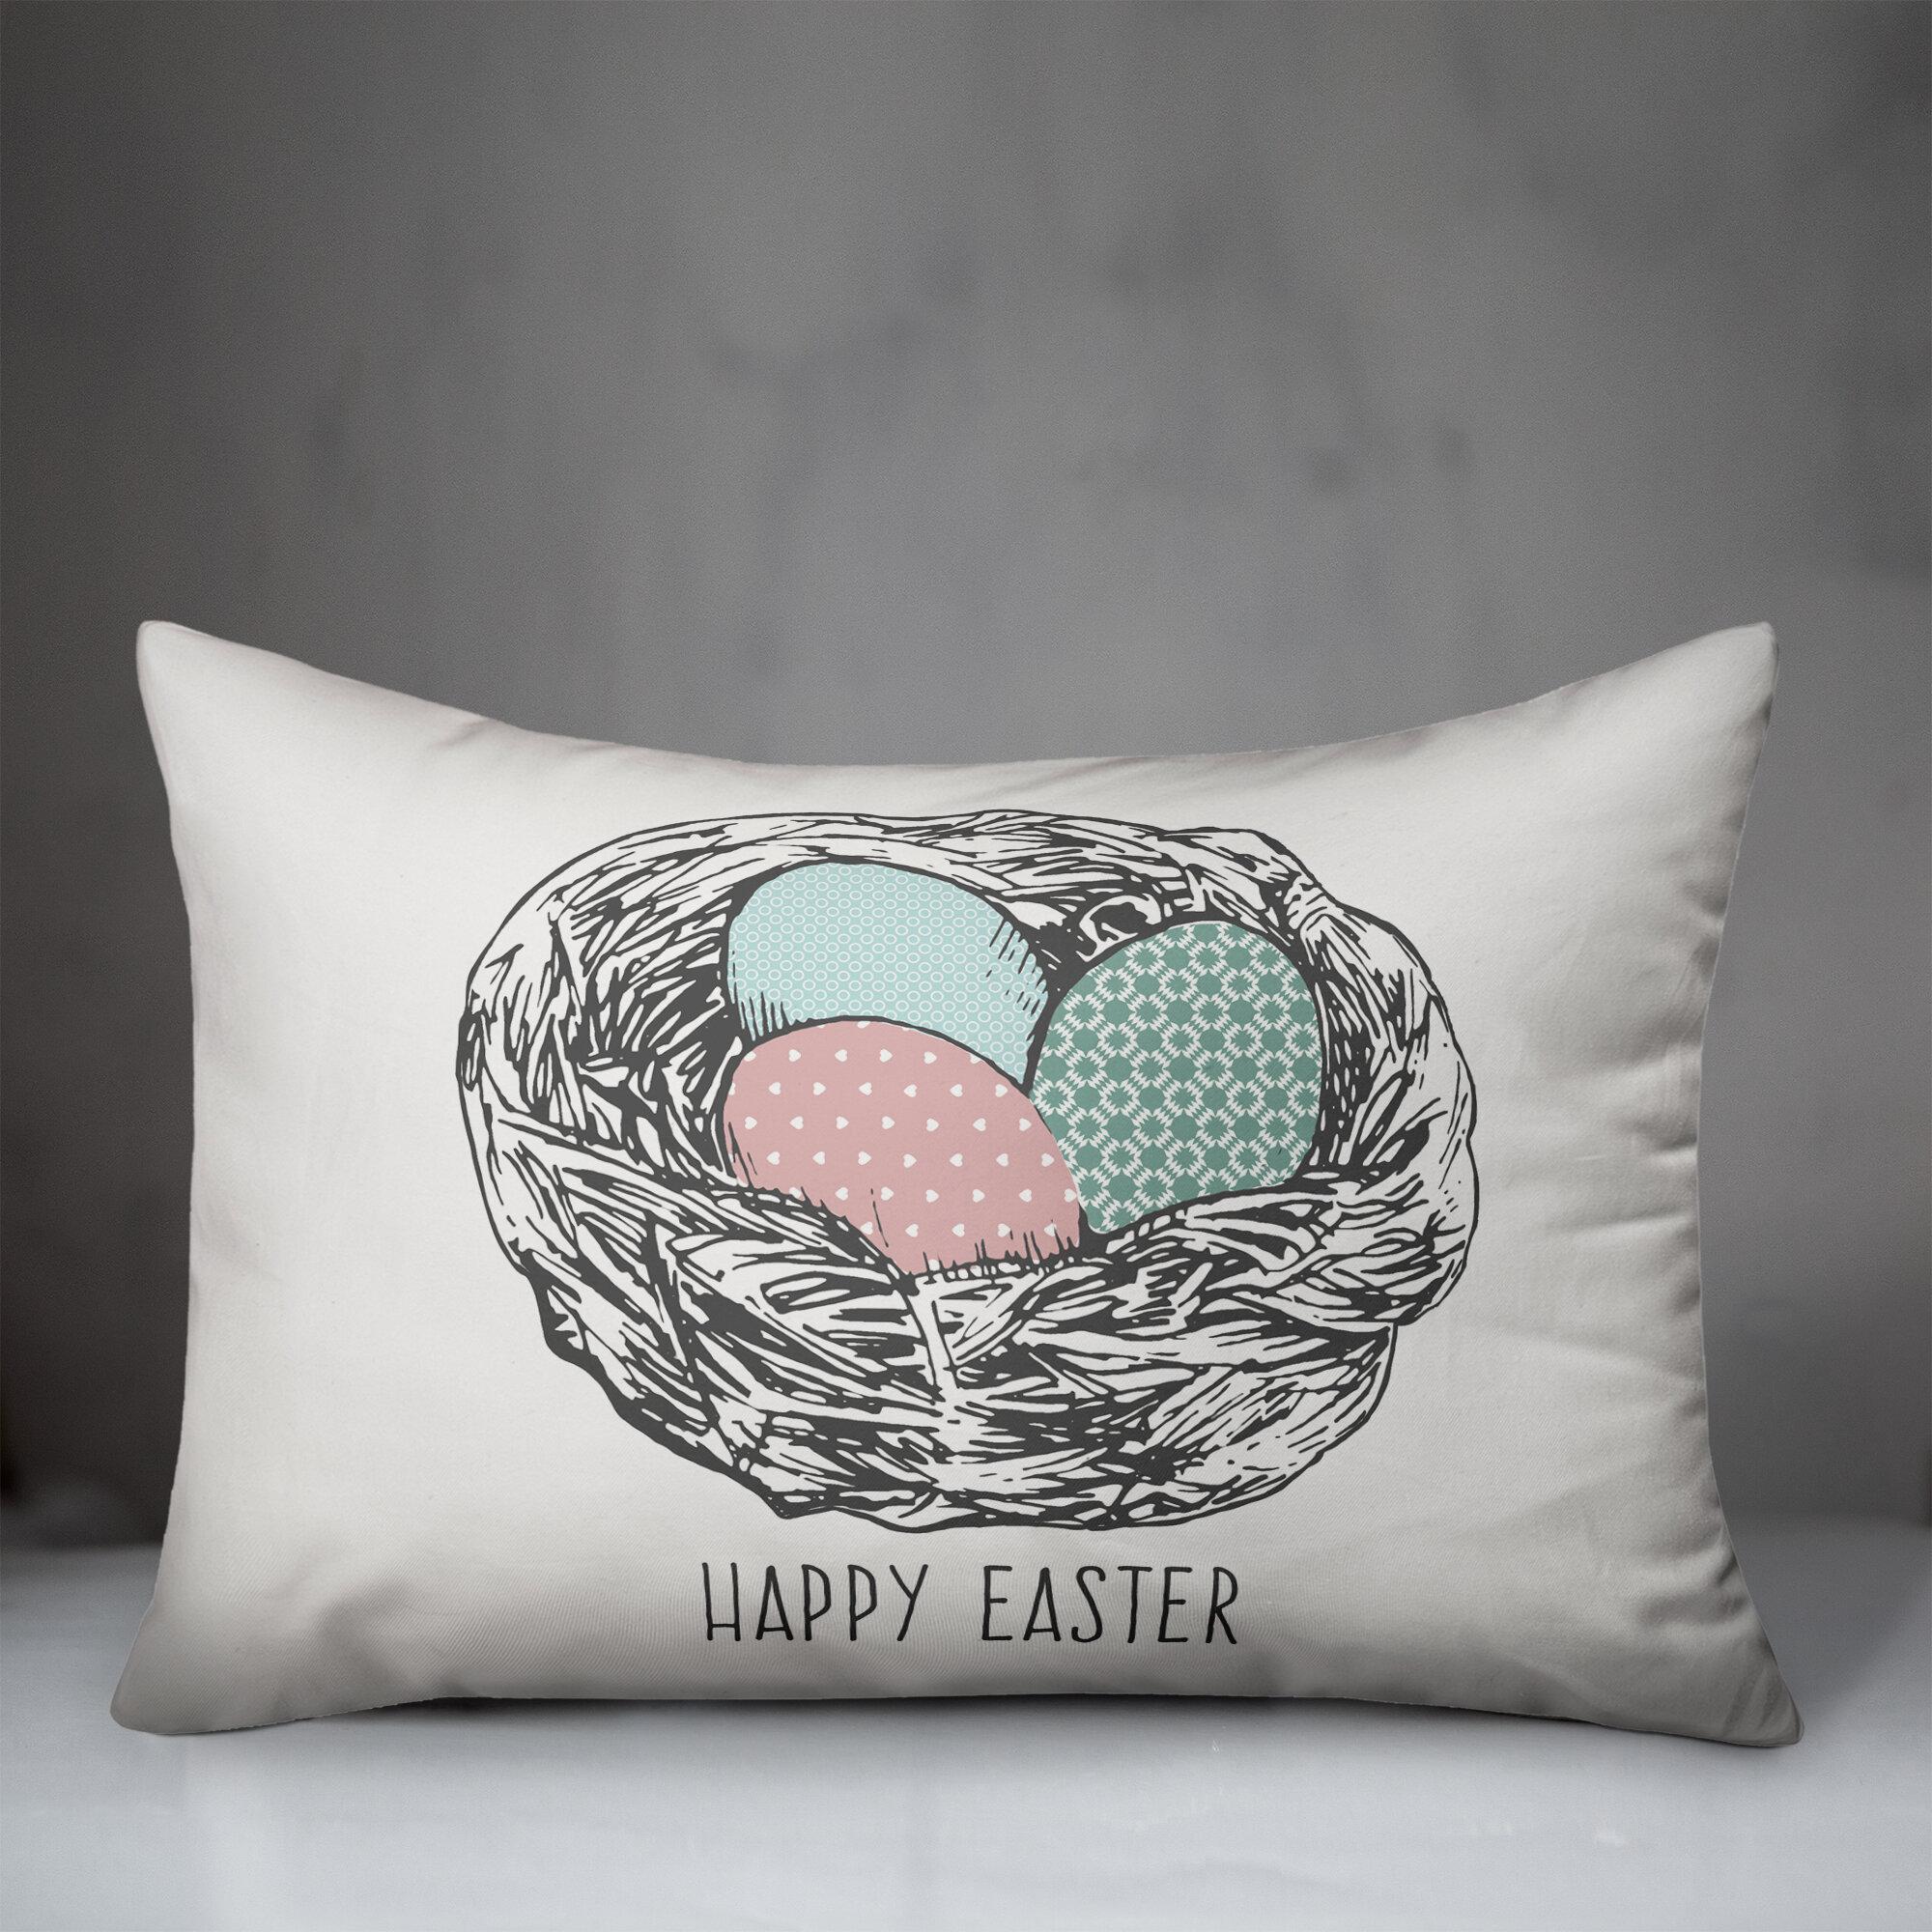 The Holiday Aisle Kerrigan Happy Easter Eggs Lumbar Pillow Wayfair